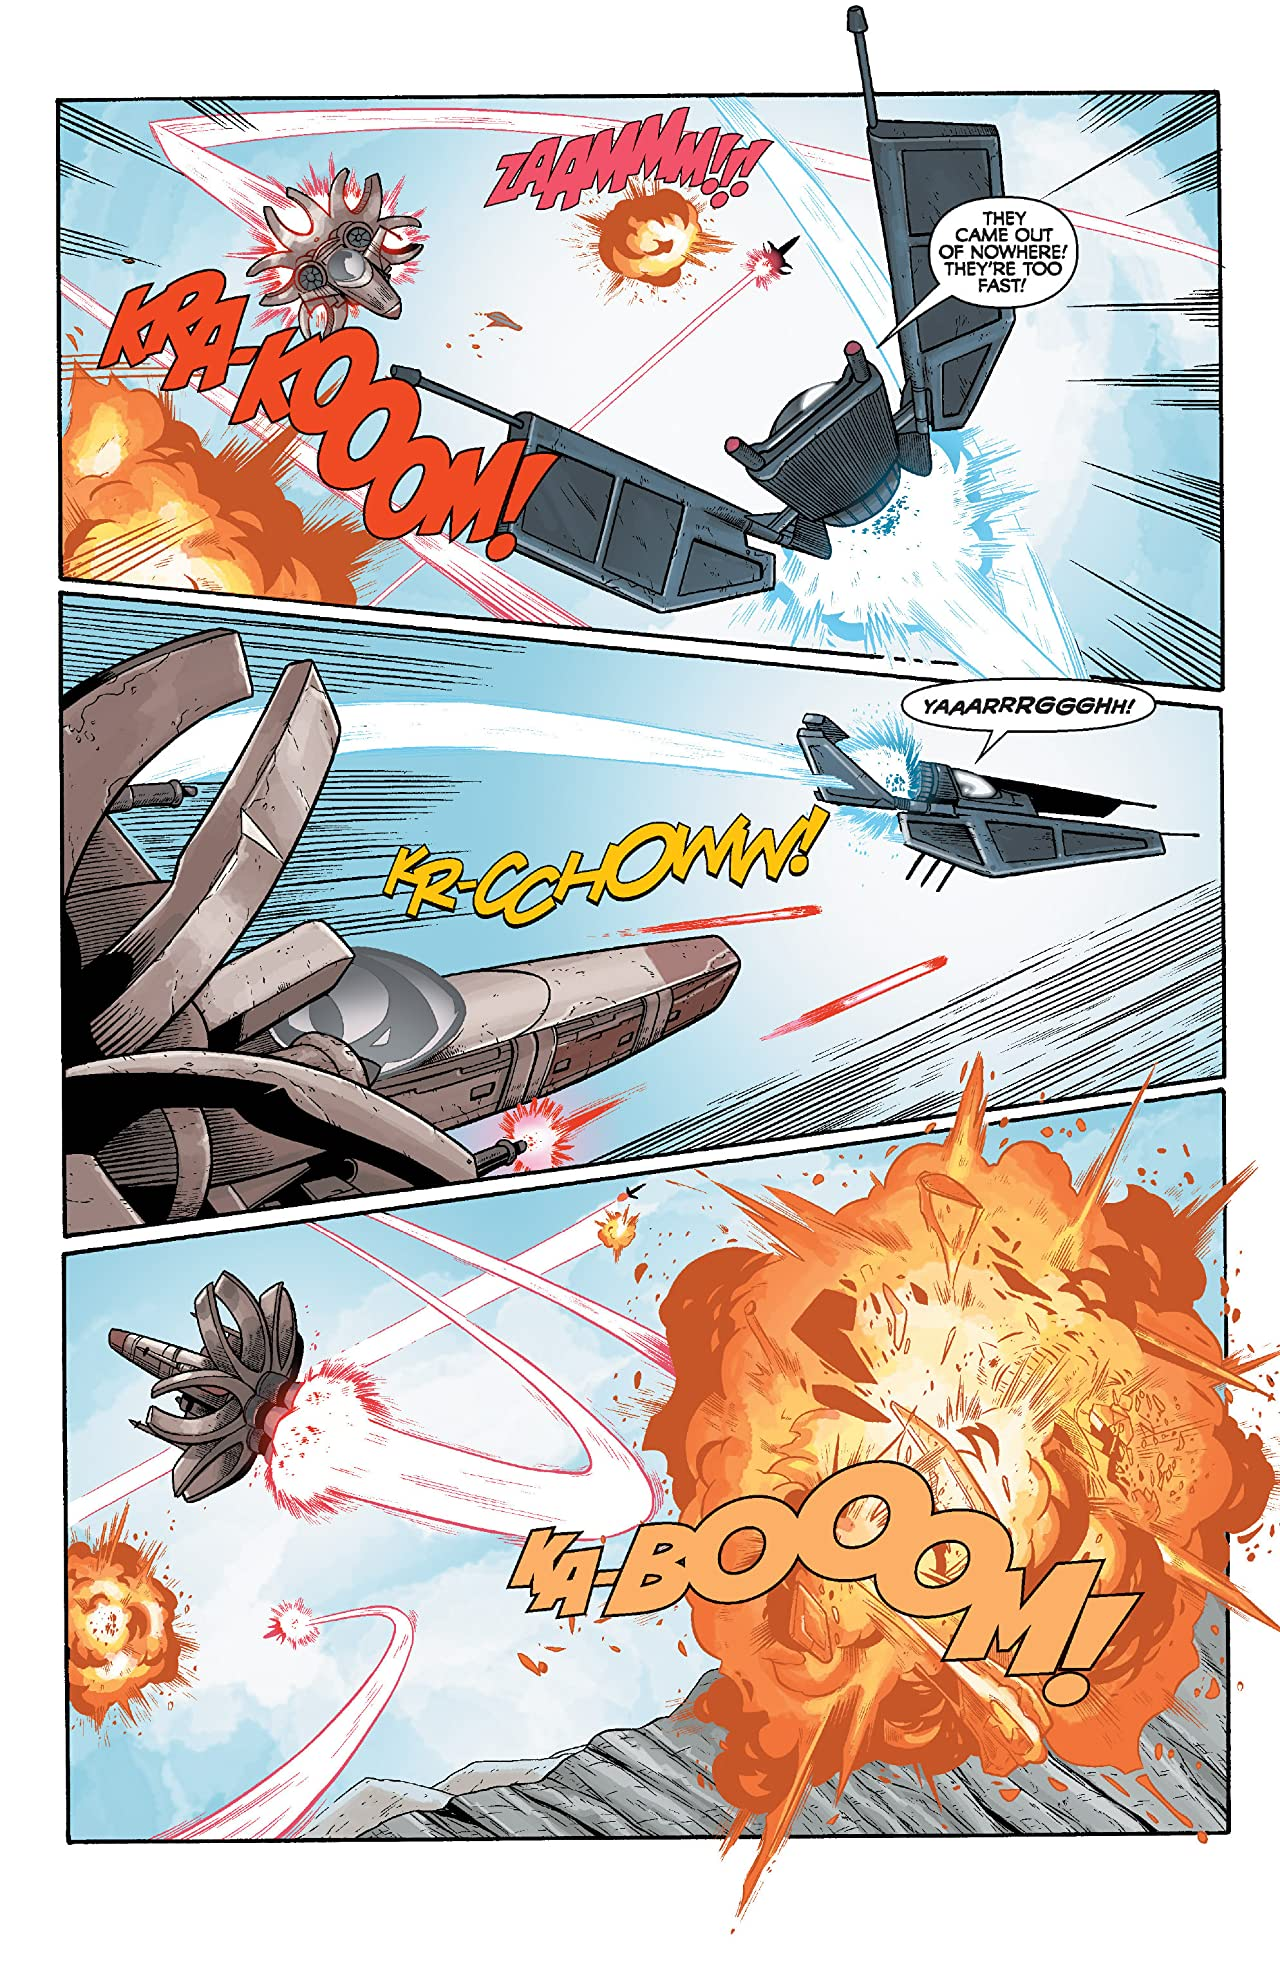 Star Wars: Knight Errant - Deluge (2011) #2 (of 5)